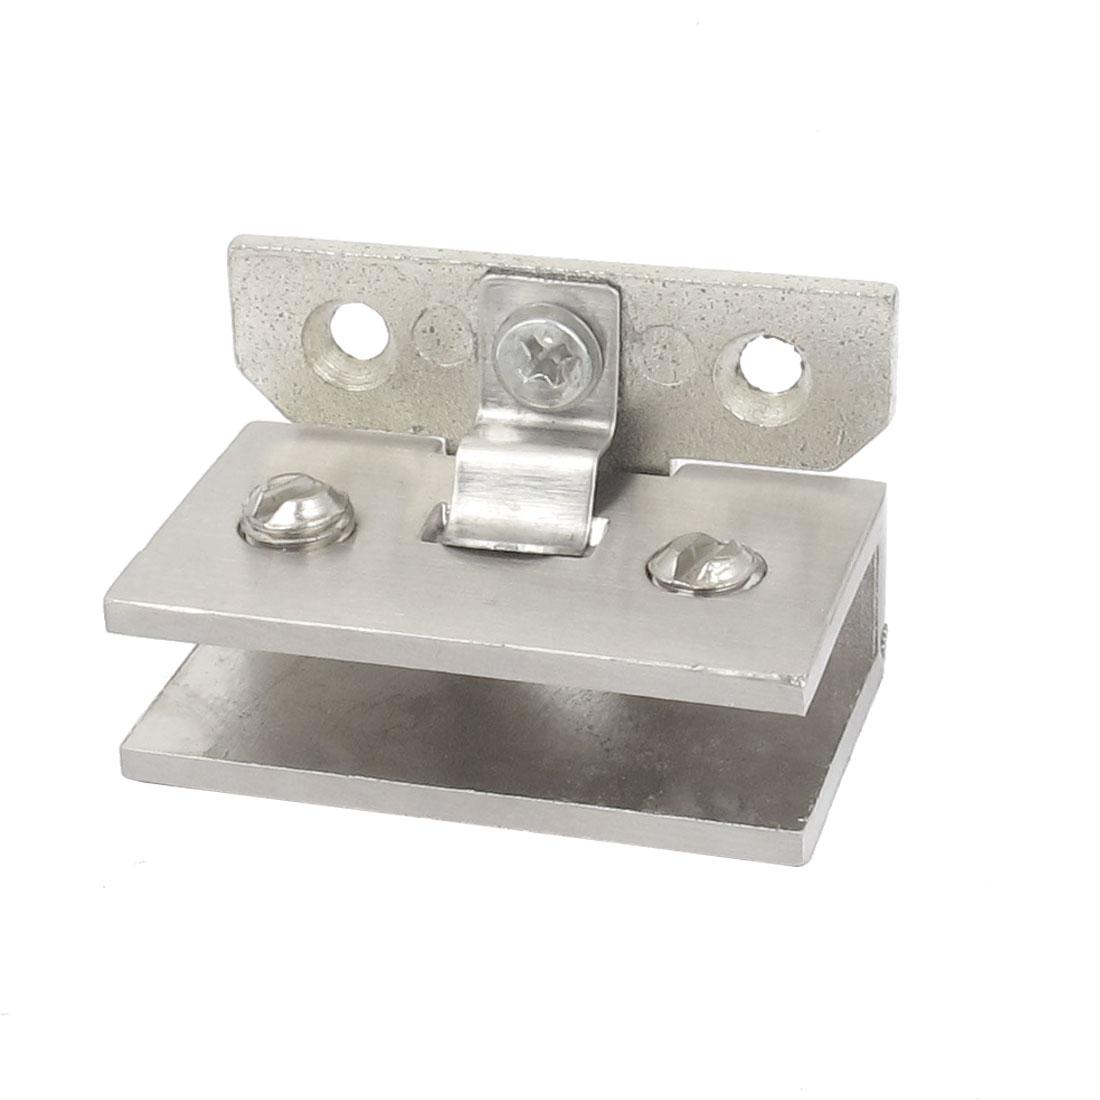 Zinc Alloy 6mm Thick Glass Shelf Shower Door Clip Clamp Support Bracket